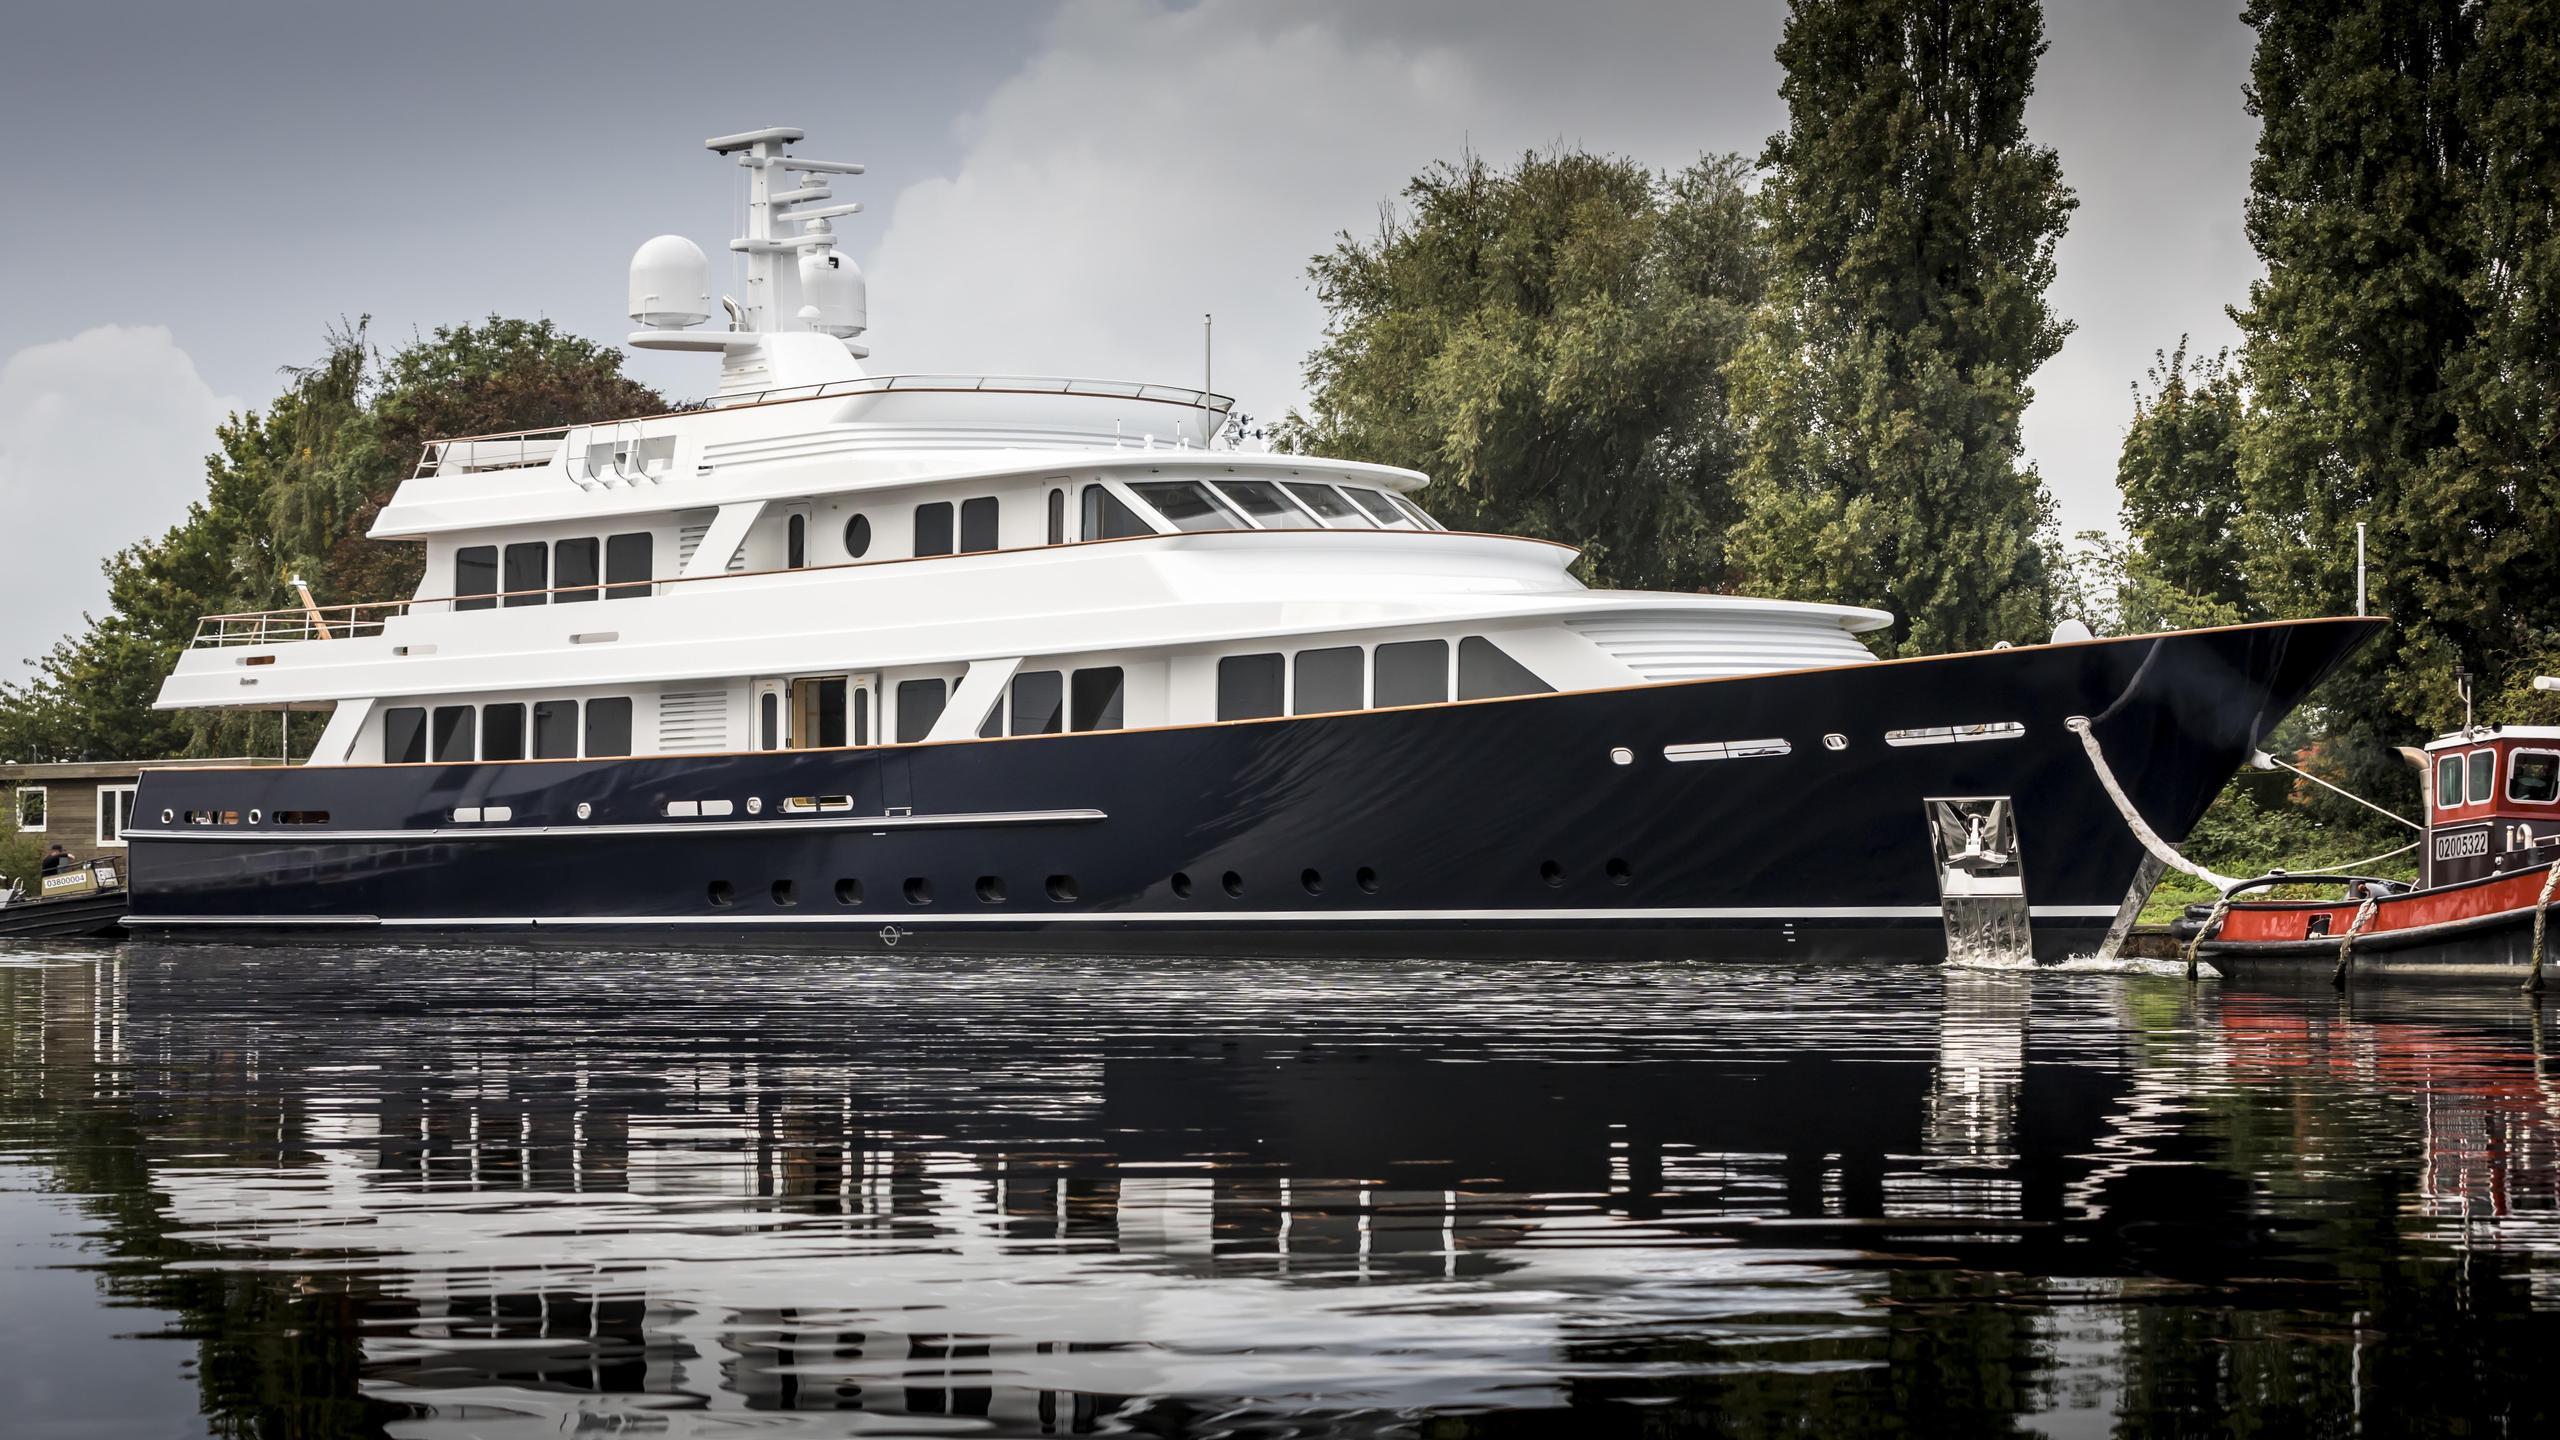 valoria b femke hull 697 motoryacht feadship 47m 2017 launch half profile